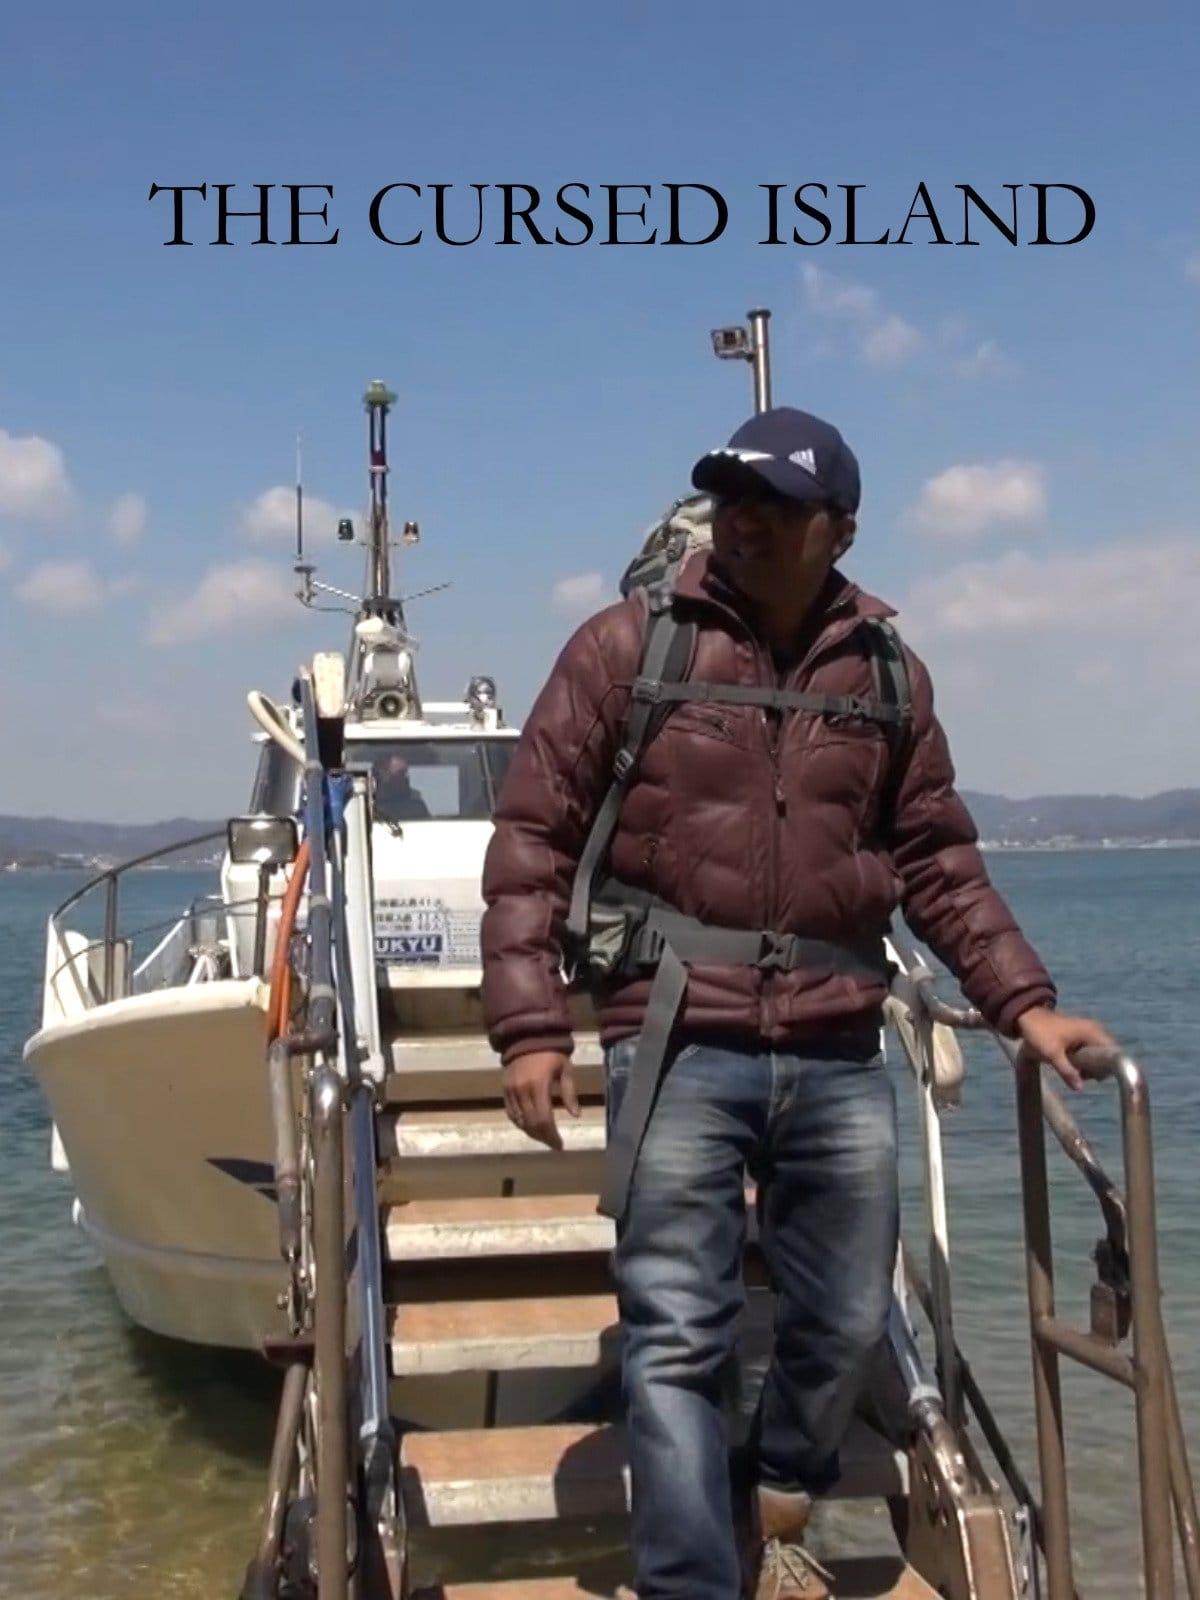 The Cursed Island (1970)